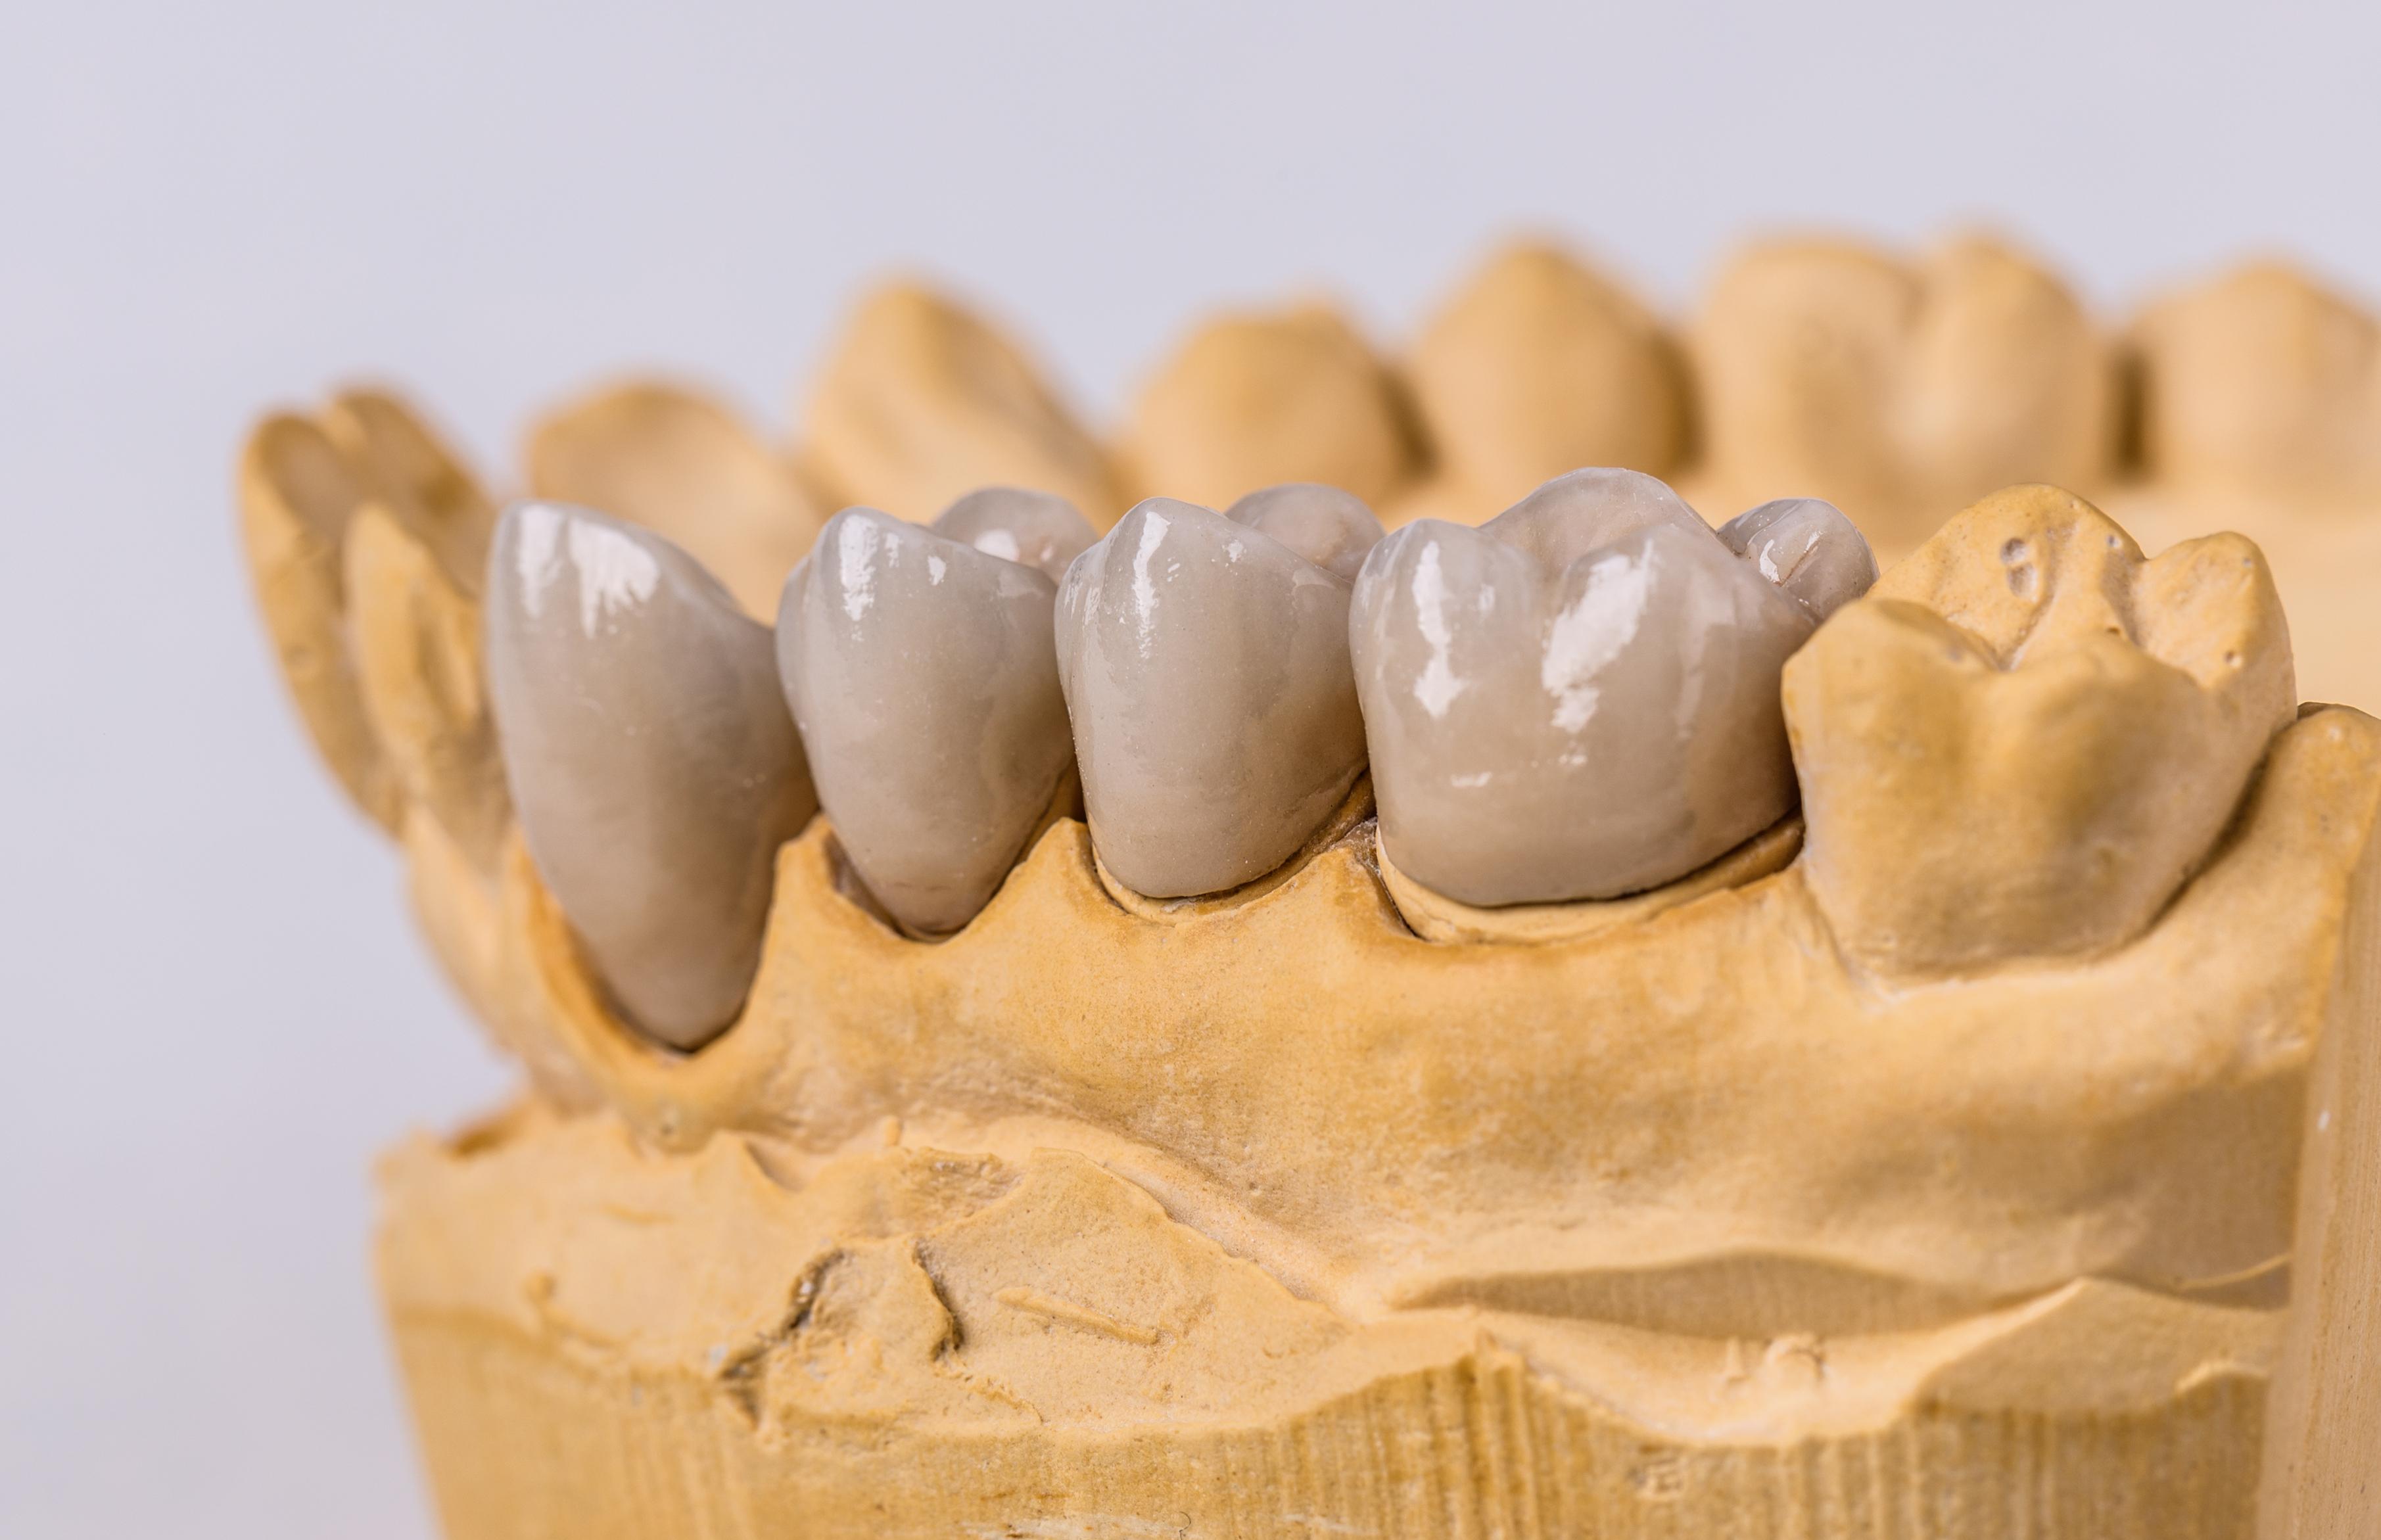 Ceramic dental implants on gypsum layout close-up